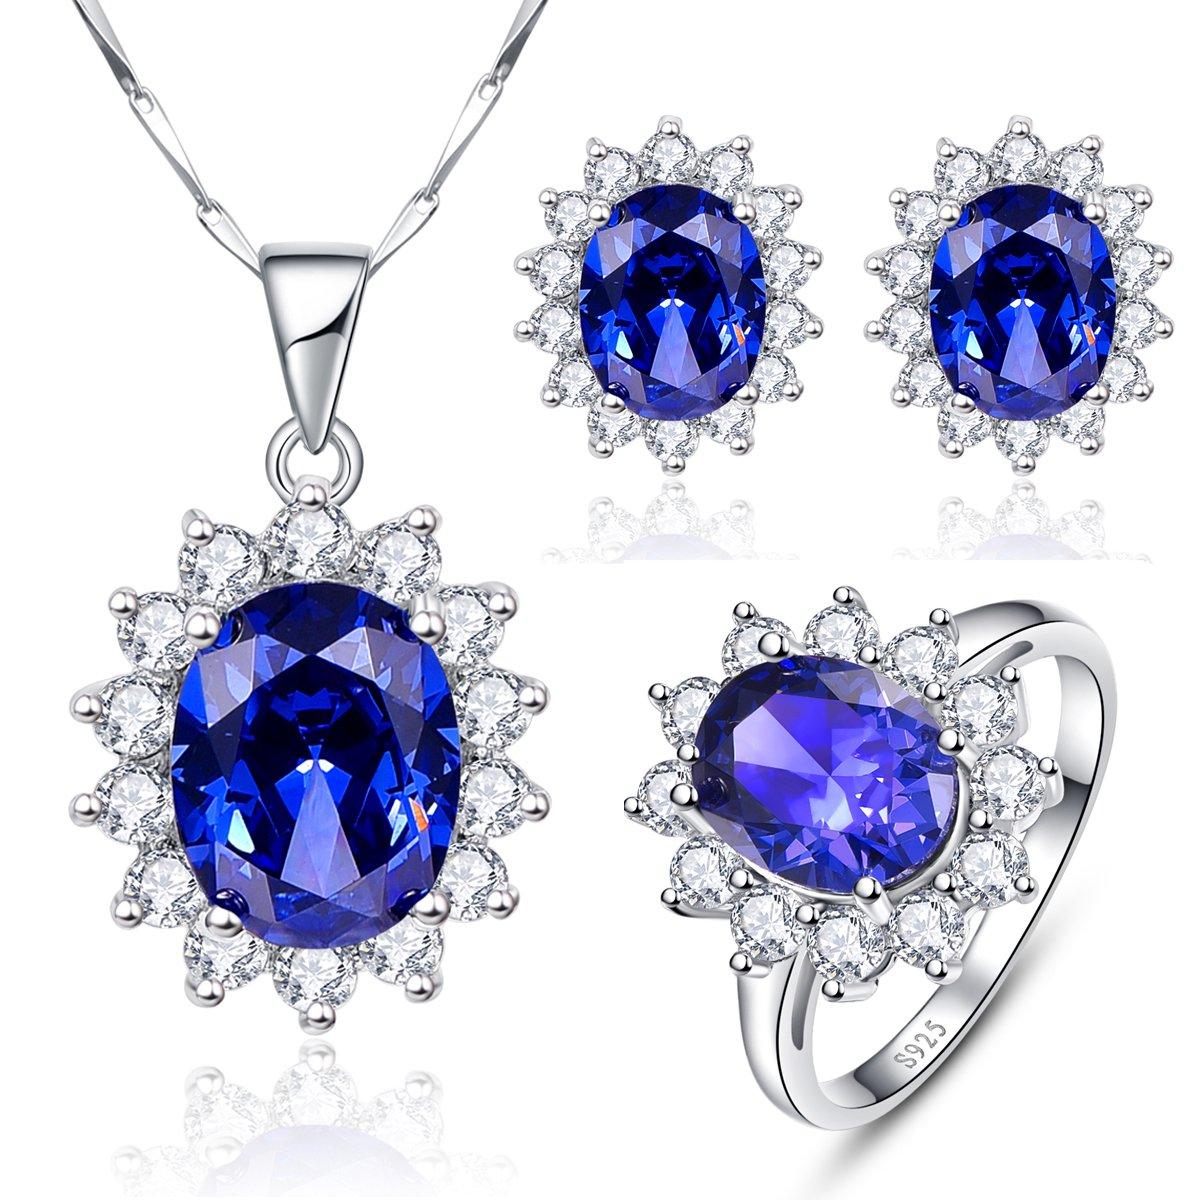 BONLAVIE Women's Princess Diana William Kate Blue Tanzanite Jewelry Sets 925 Sterling Silver Ring Necklace Earrings, 7